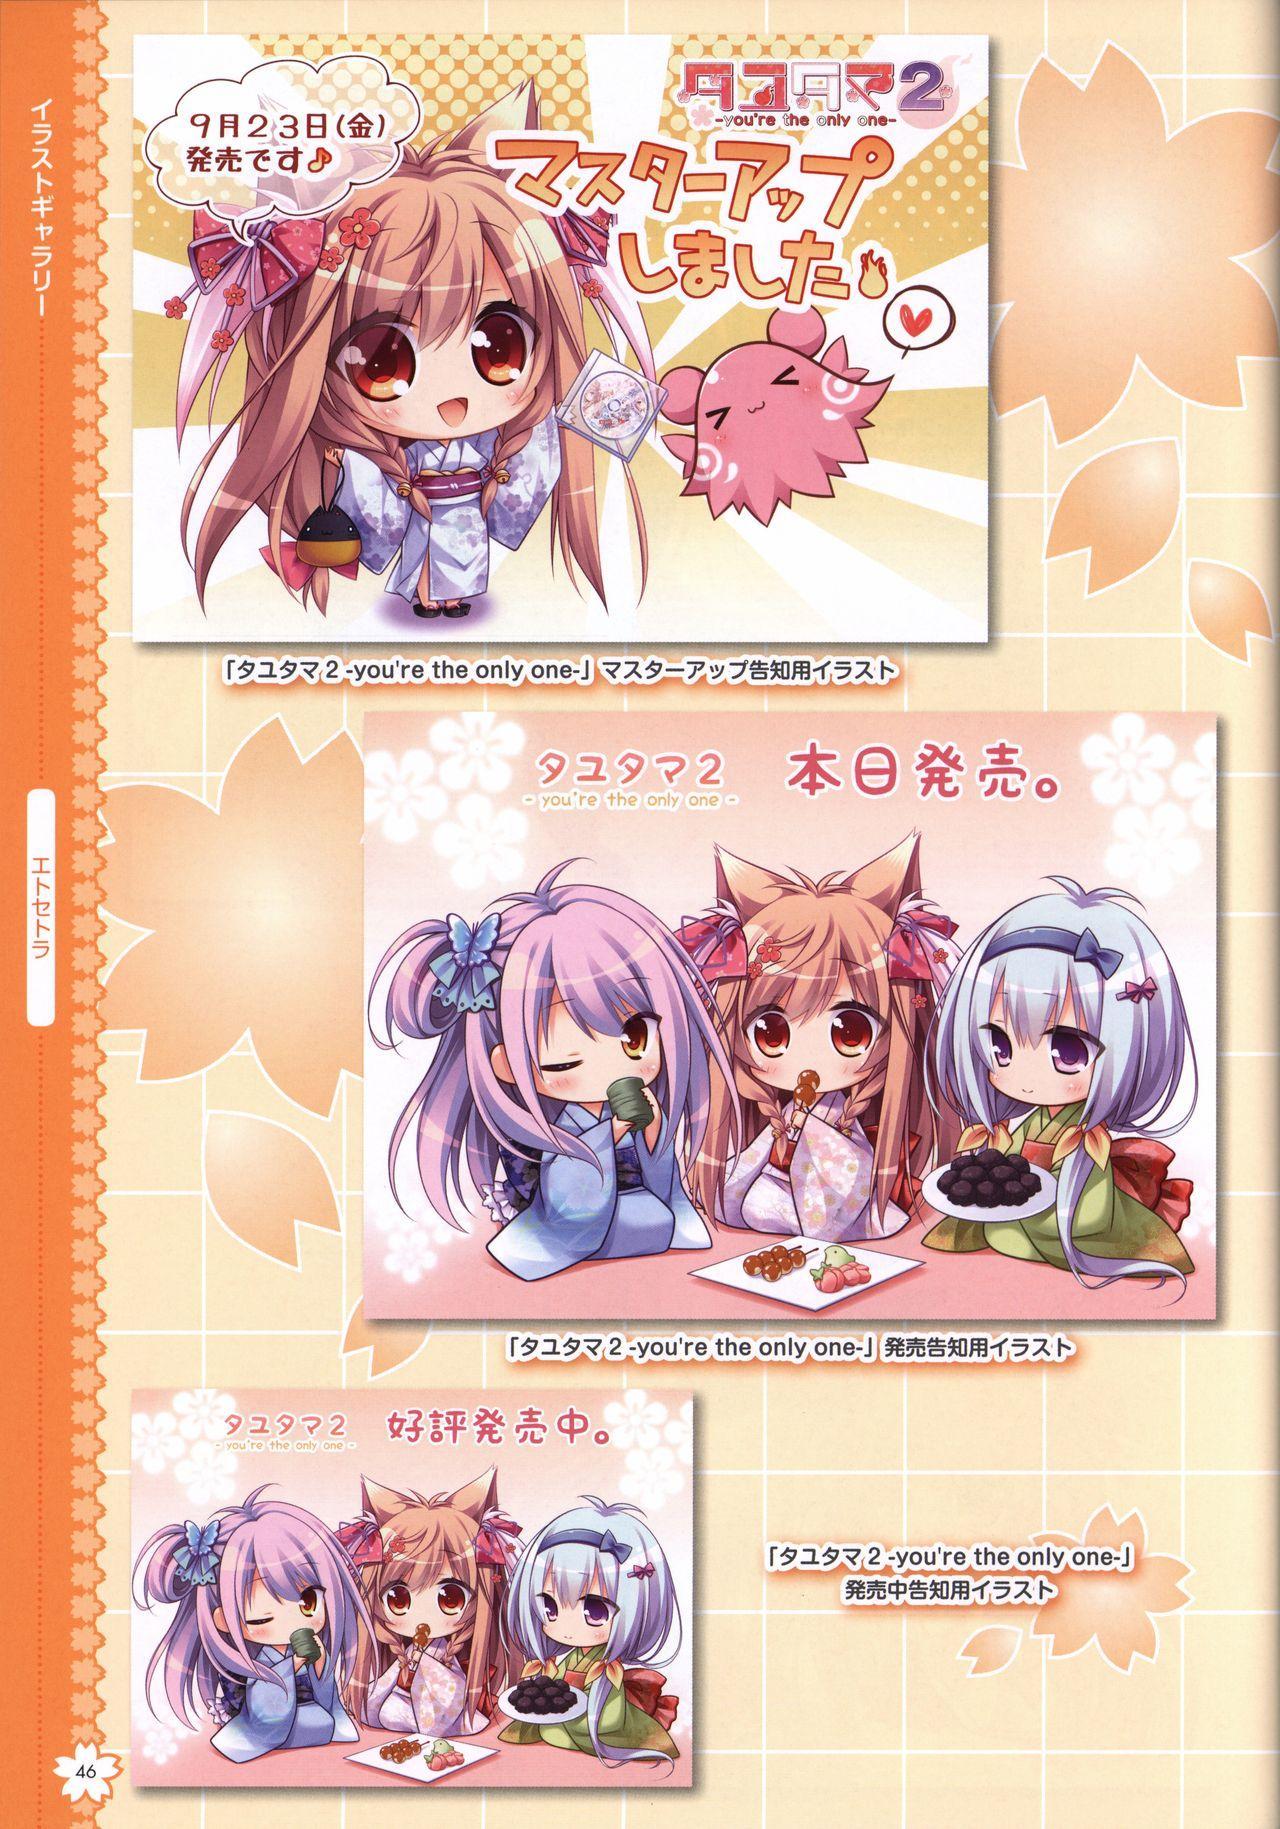 Tayutama2 Visual Art Fanbook 48